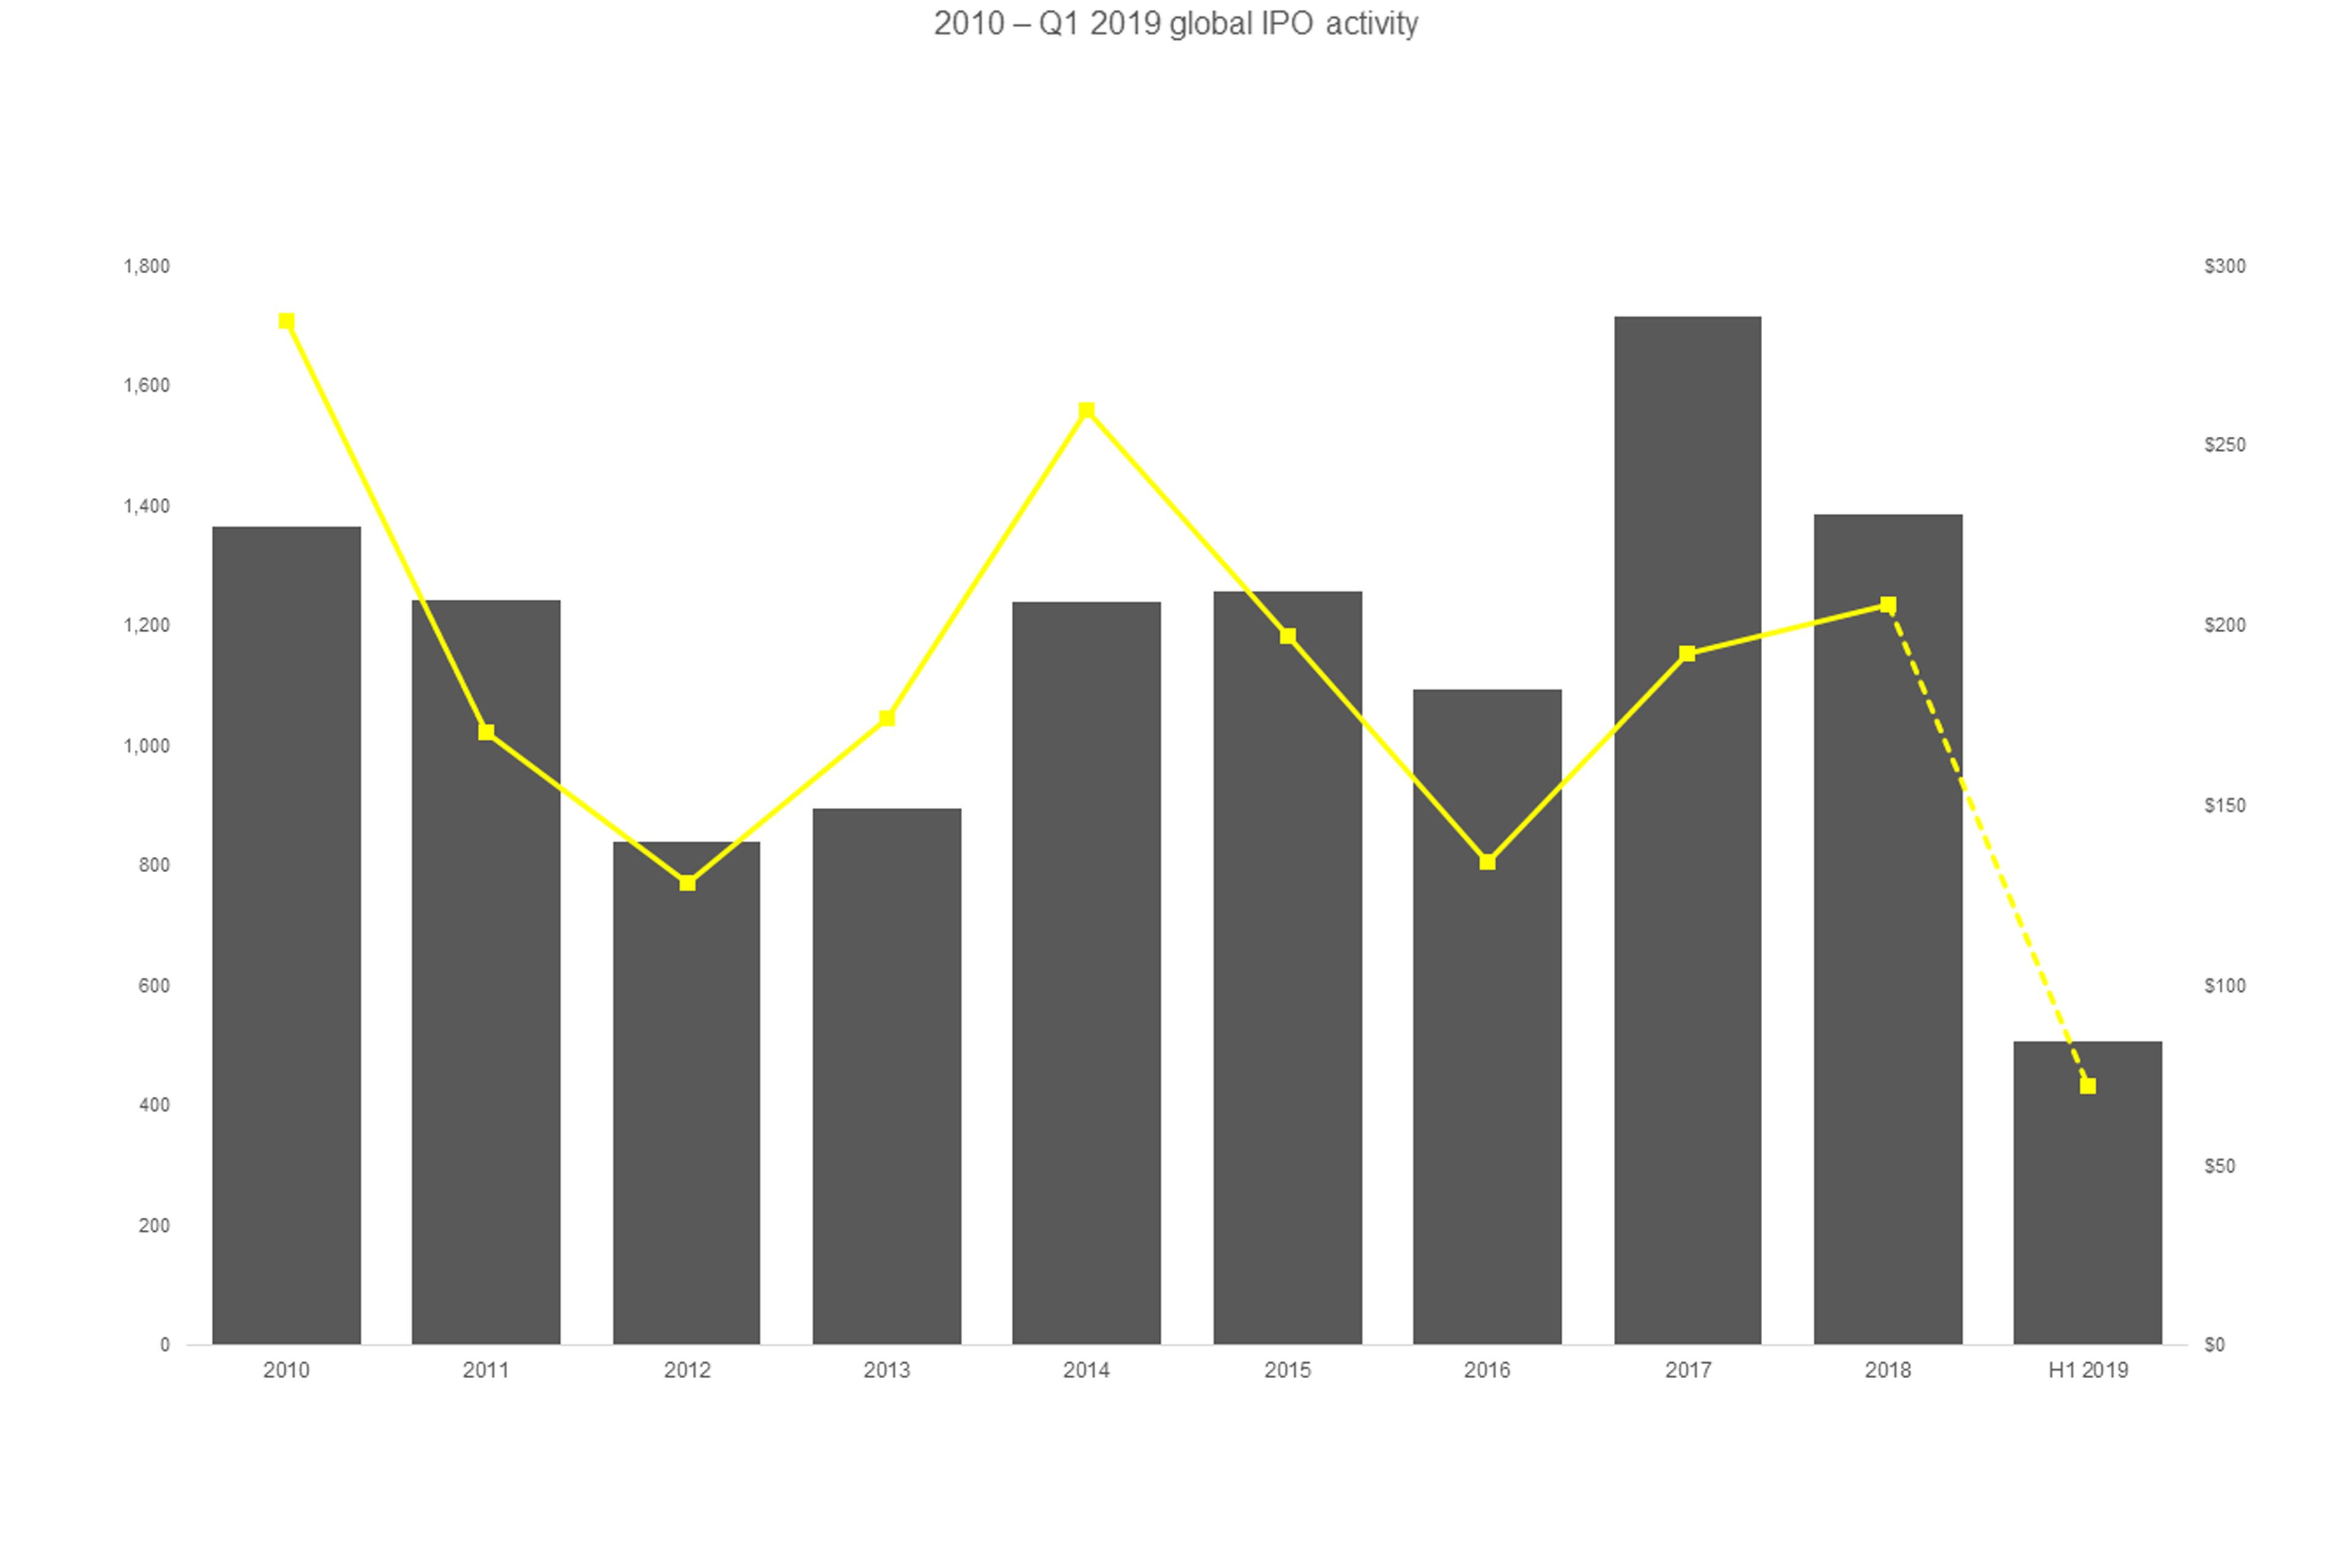 2010 – Q1 2019 global IPO activity